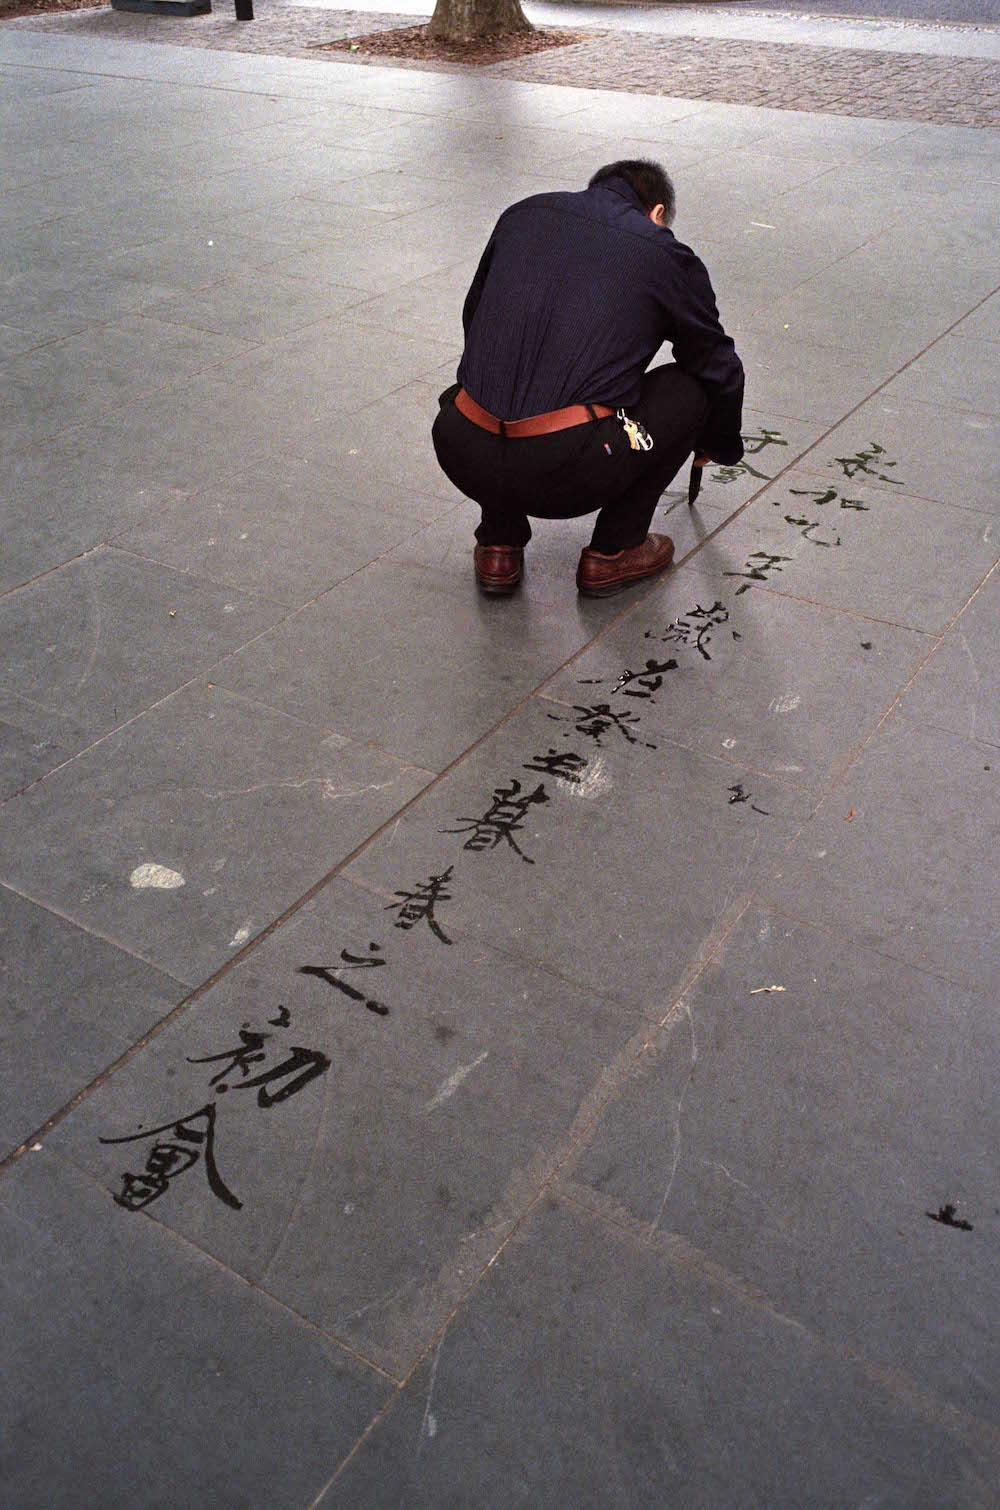 duran-levinson-shanghai-photography-6.jpg